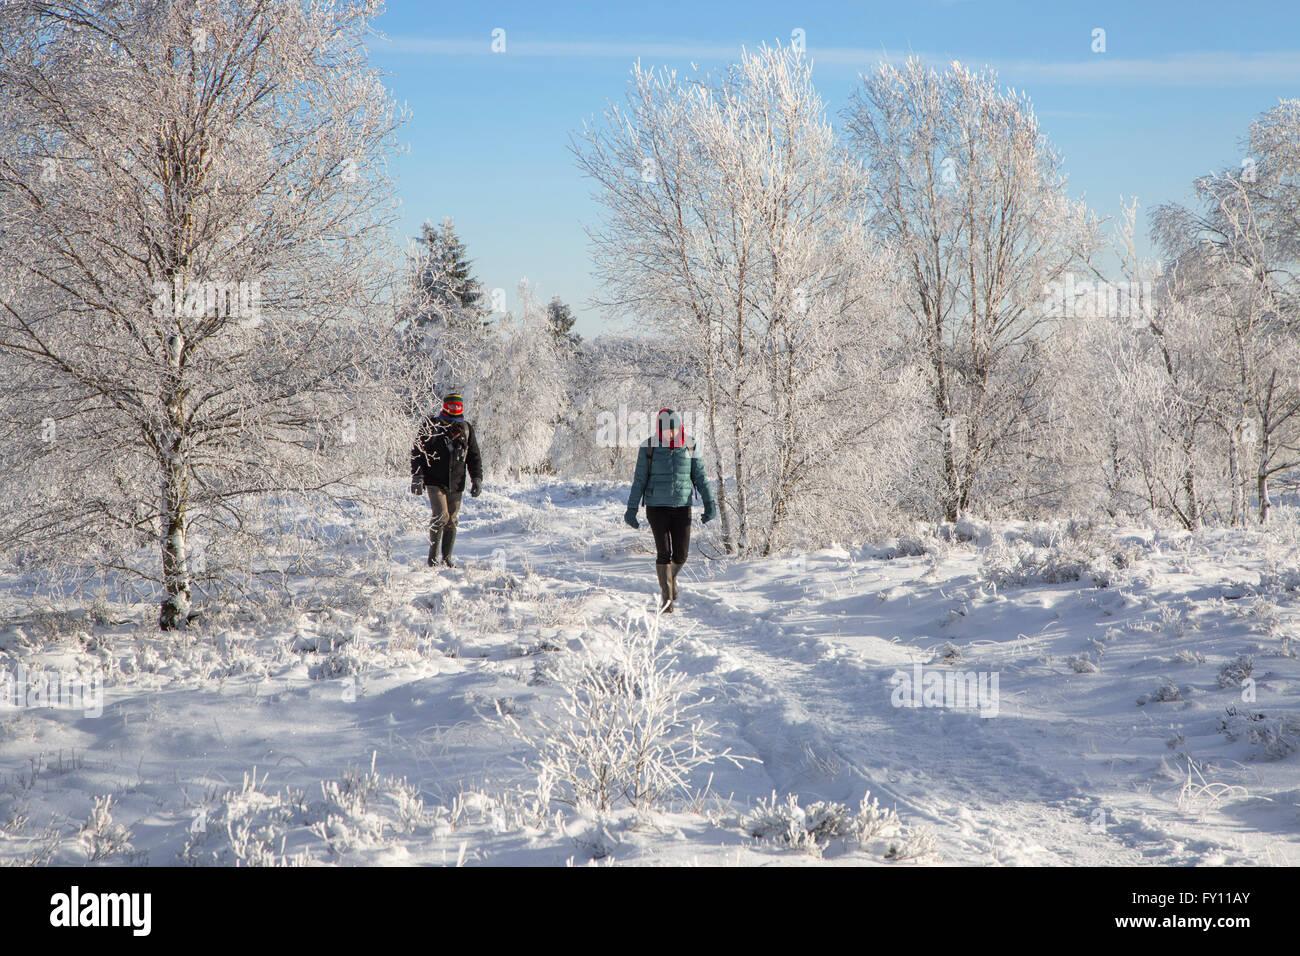 Two walkers walking in the snow in winter at Hoge Venen / High Fens / Hautes Fagnes, Belgian nature reserve in Liège, - Stock Image